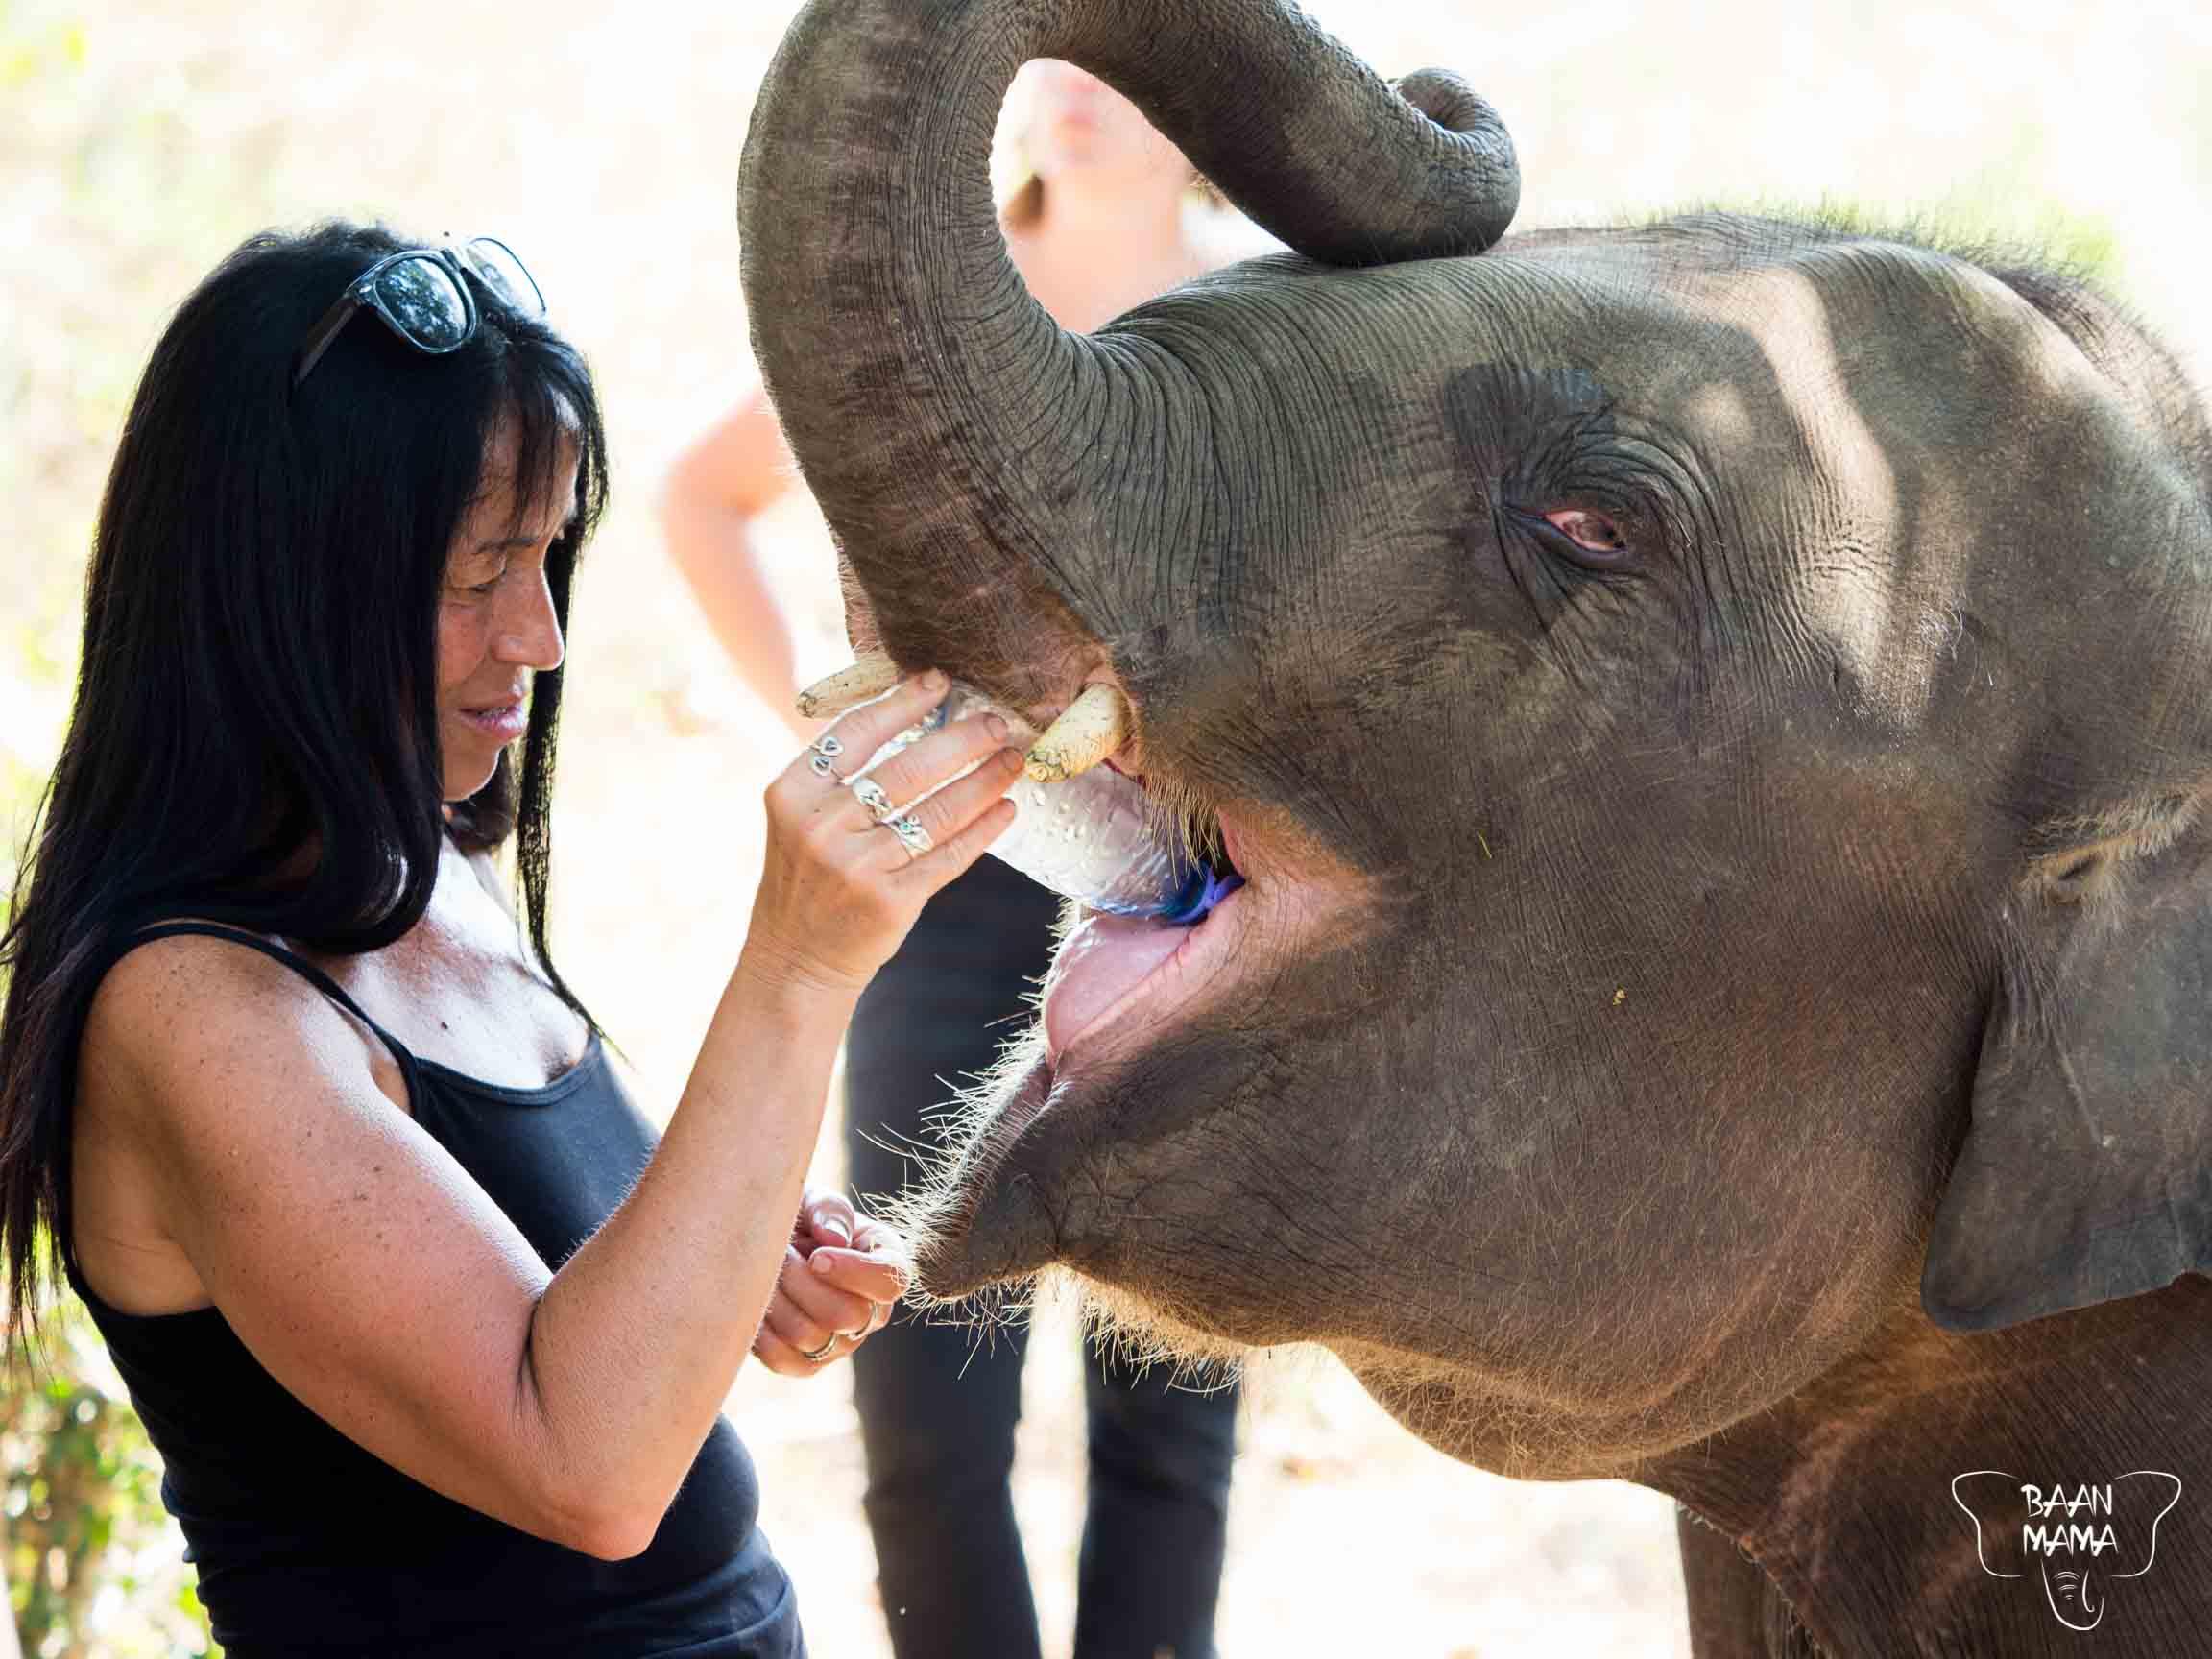 Volontariat 2019 Baan Mama elephant